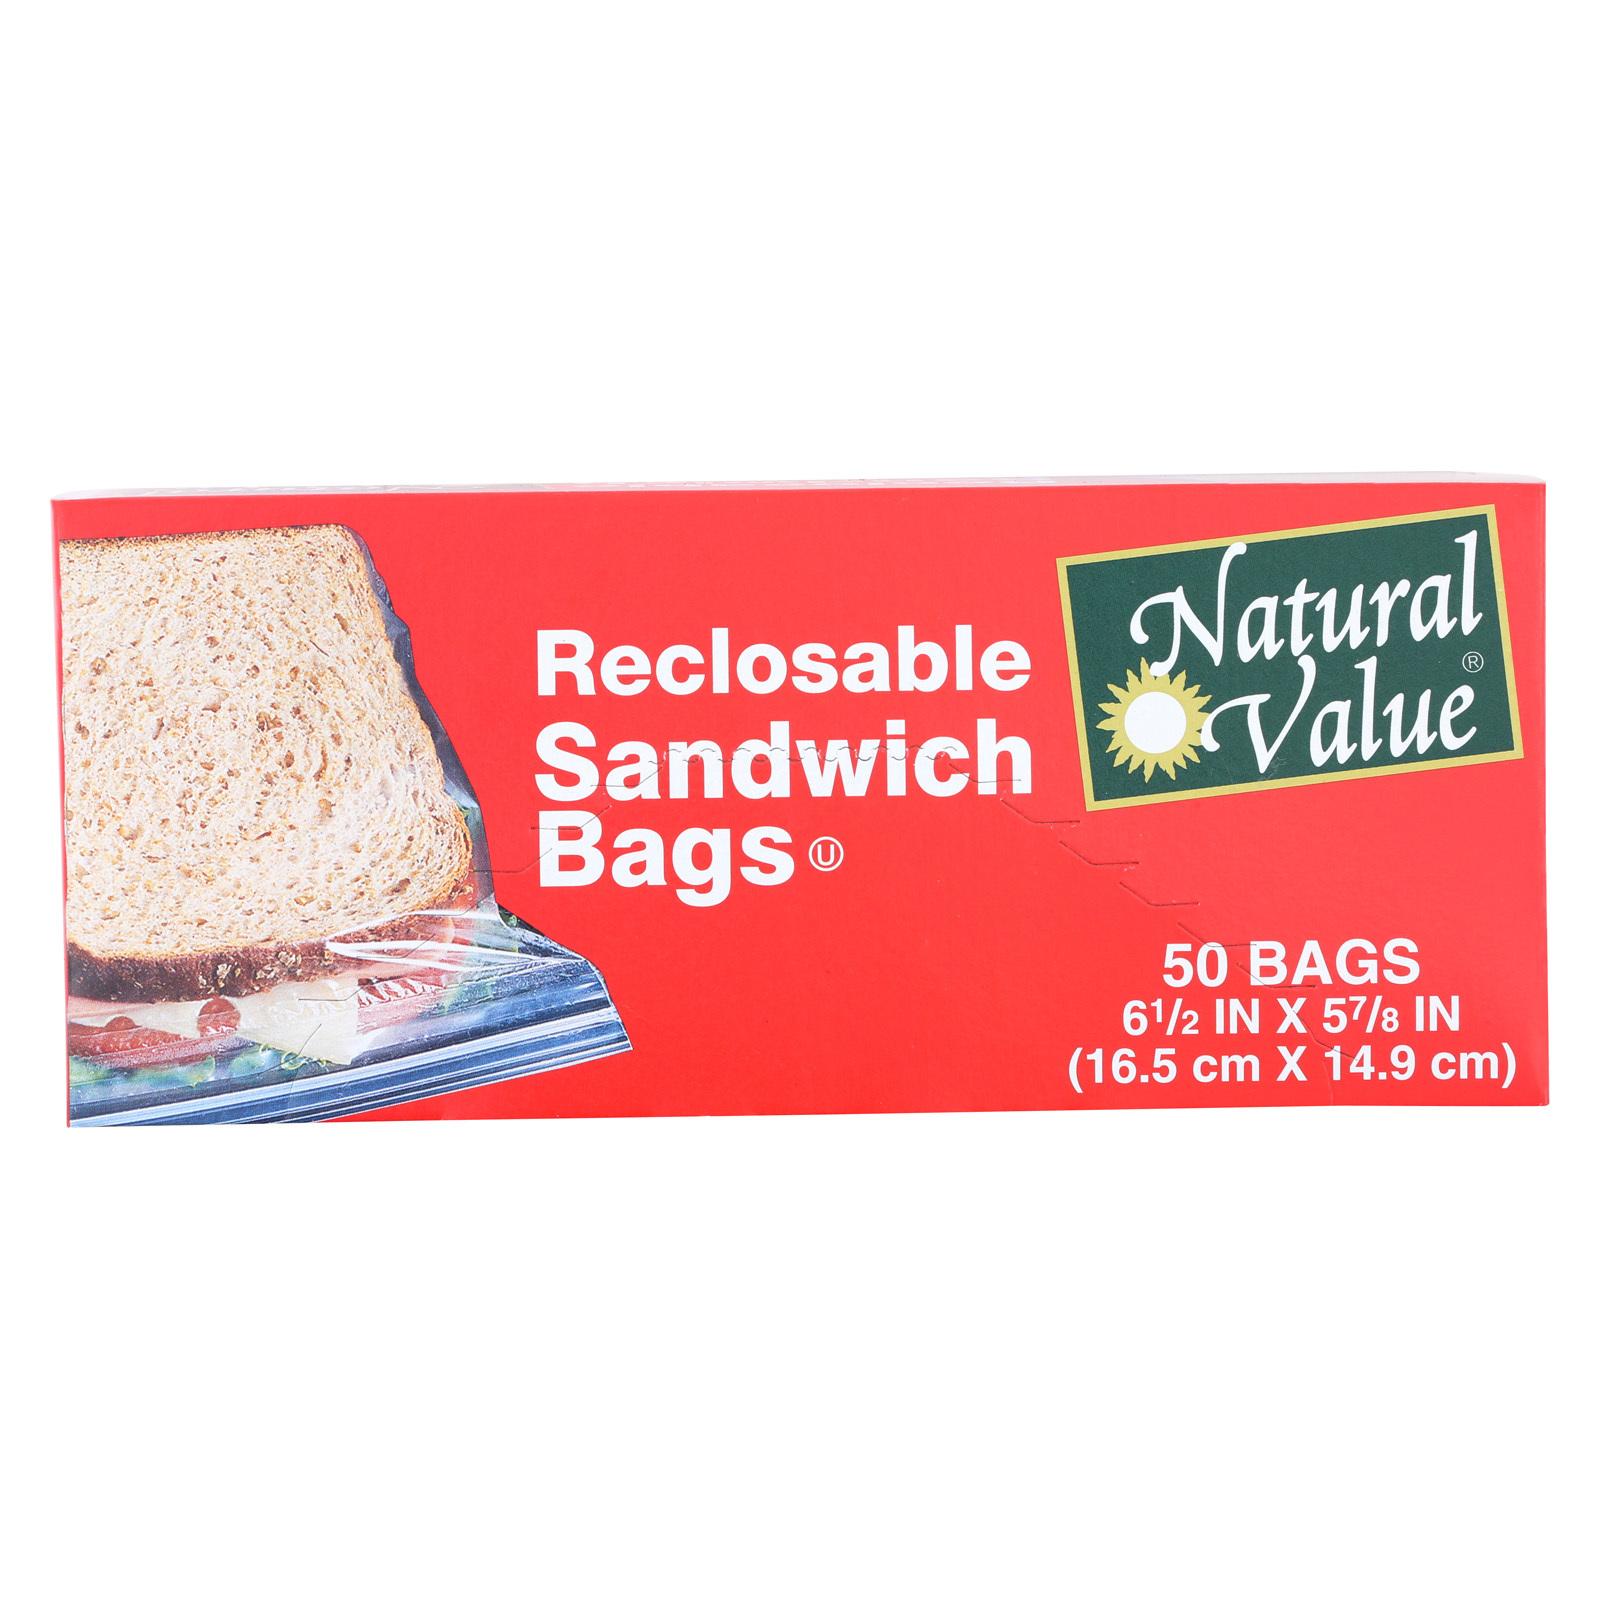 Natural Value Reclosable Sandwich Bags - Case of 12 - 50 Count